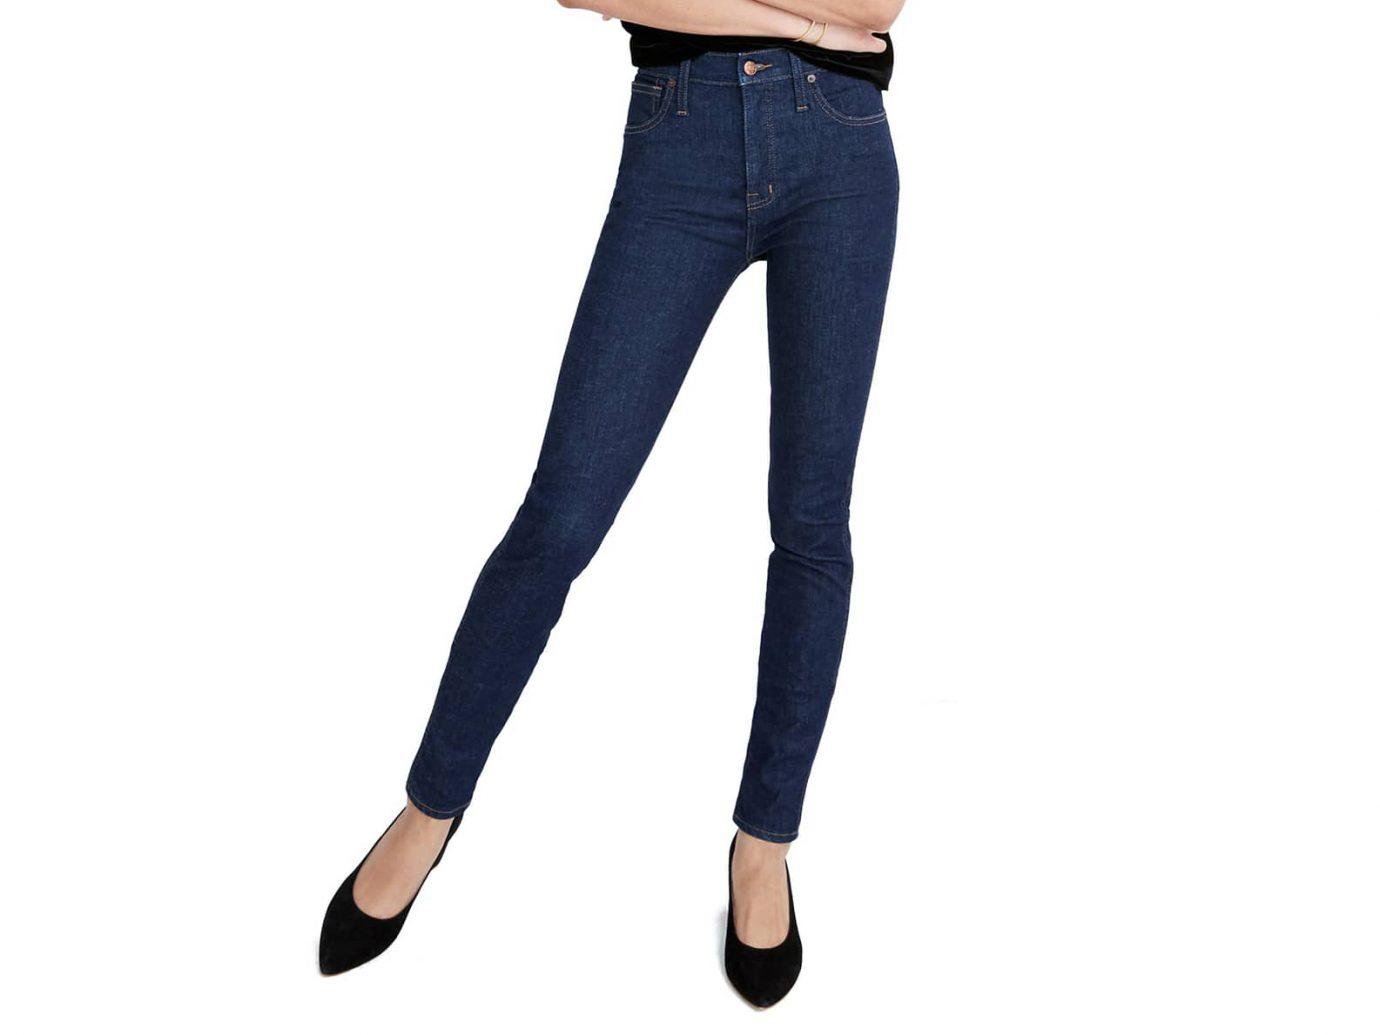 High waisted jeans madewell